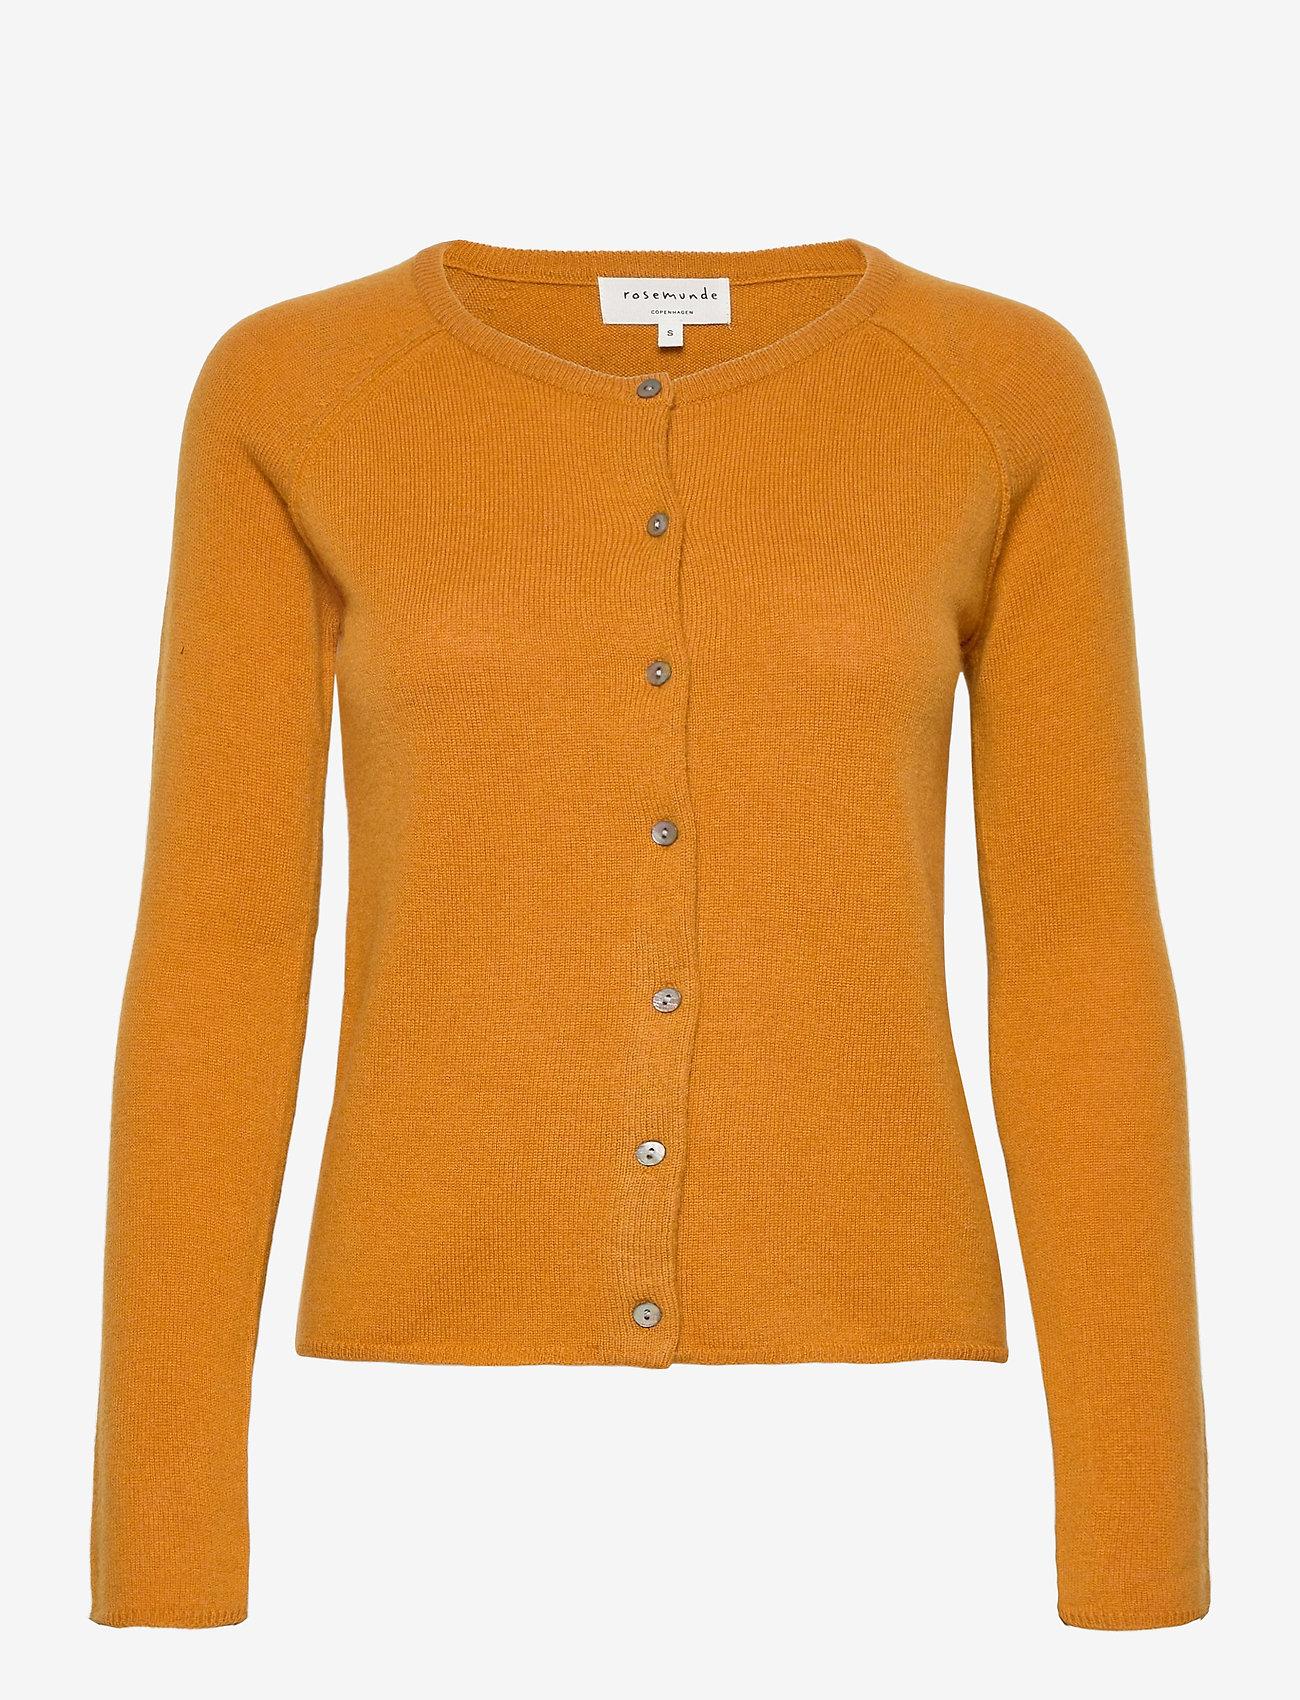 Rosemunde - Wool & cashmere cardigan ls - kashmir - golden mustard - 0